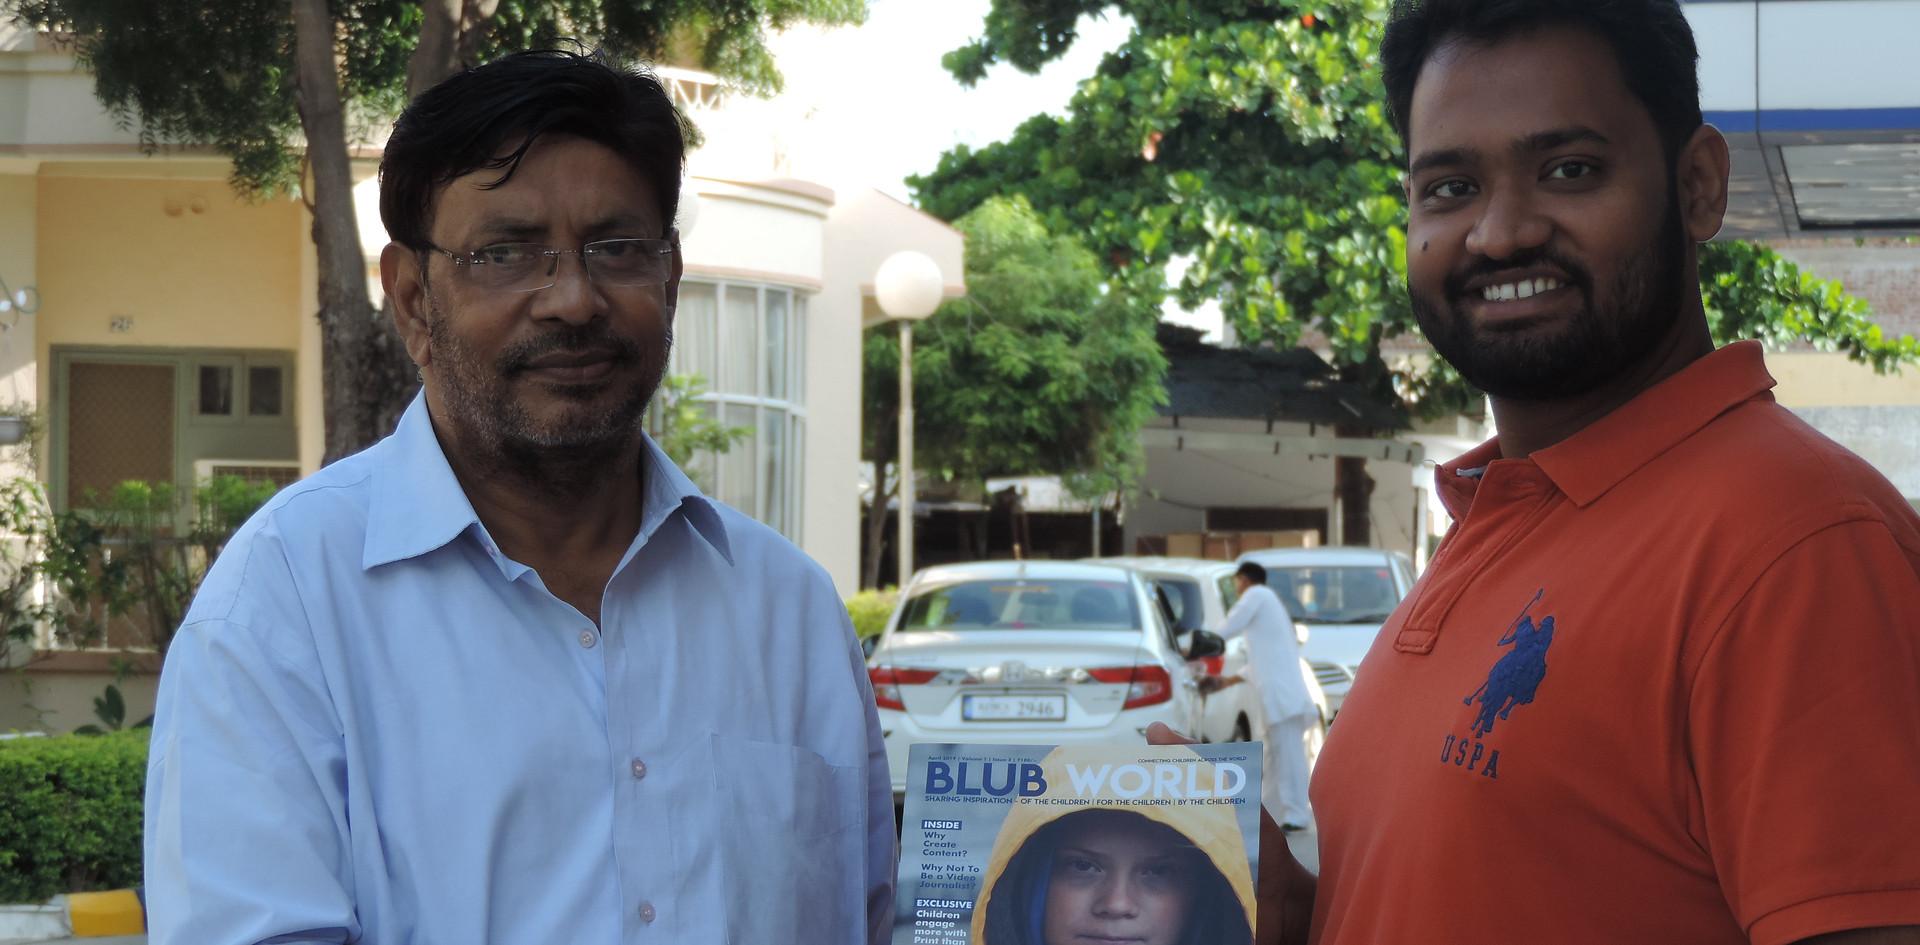 Mr. Rajeev Ranjan Nag, President, Indian Working Journalists Federation with Mr. Daksh Gaur, Founder, Blub World